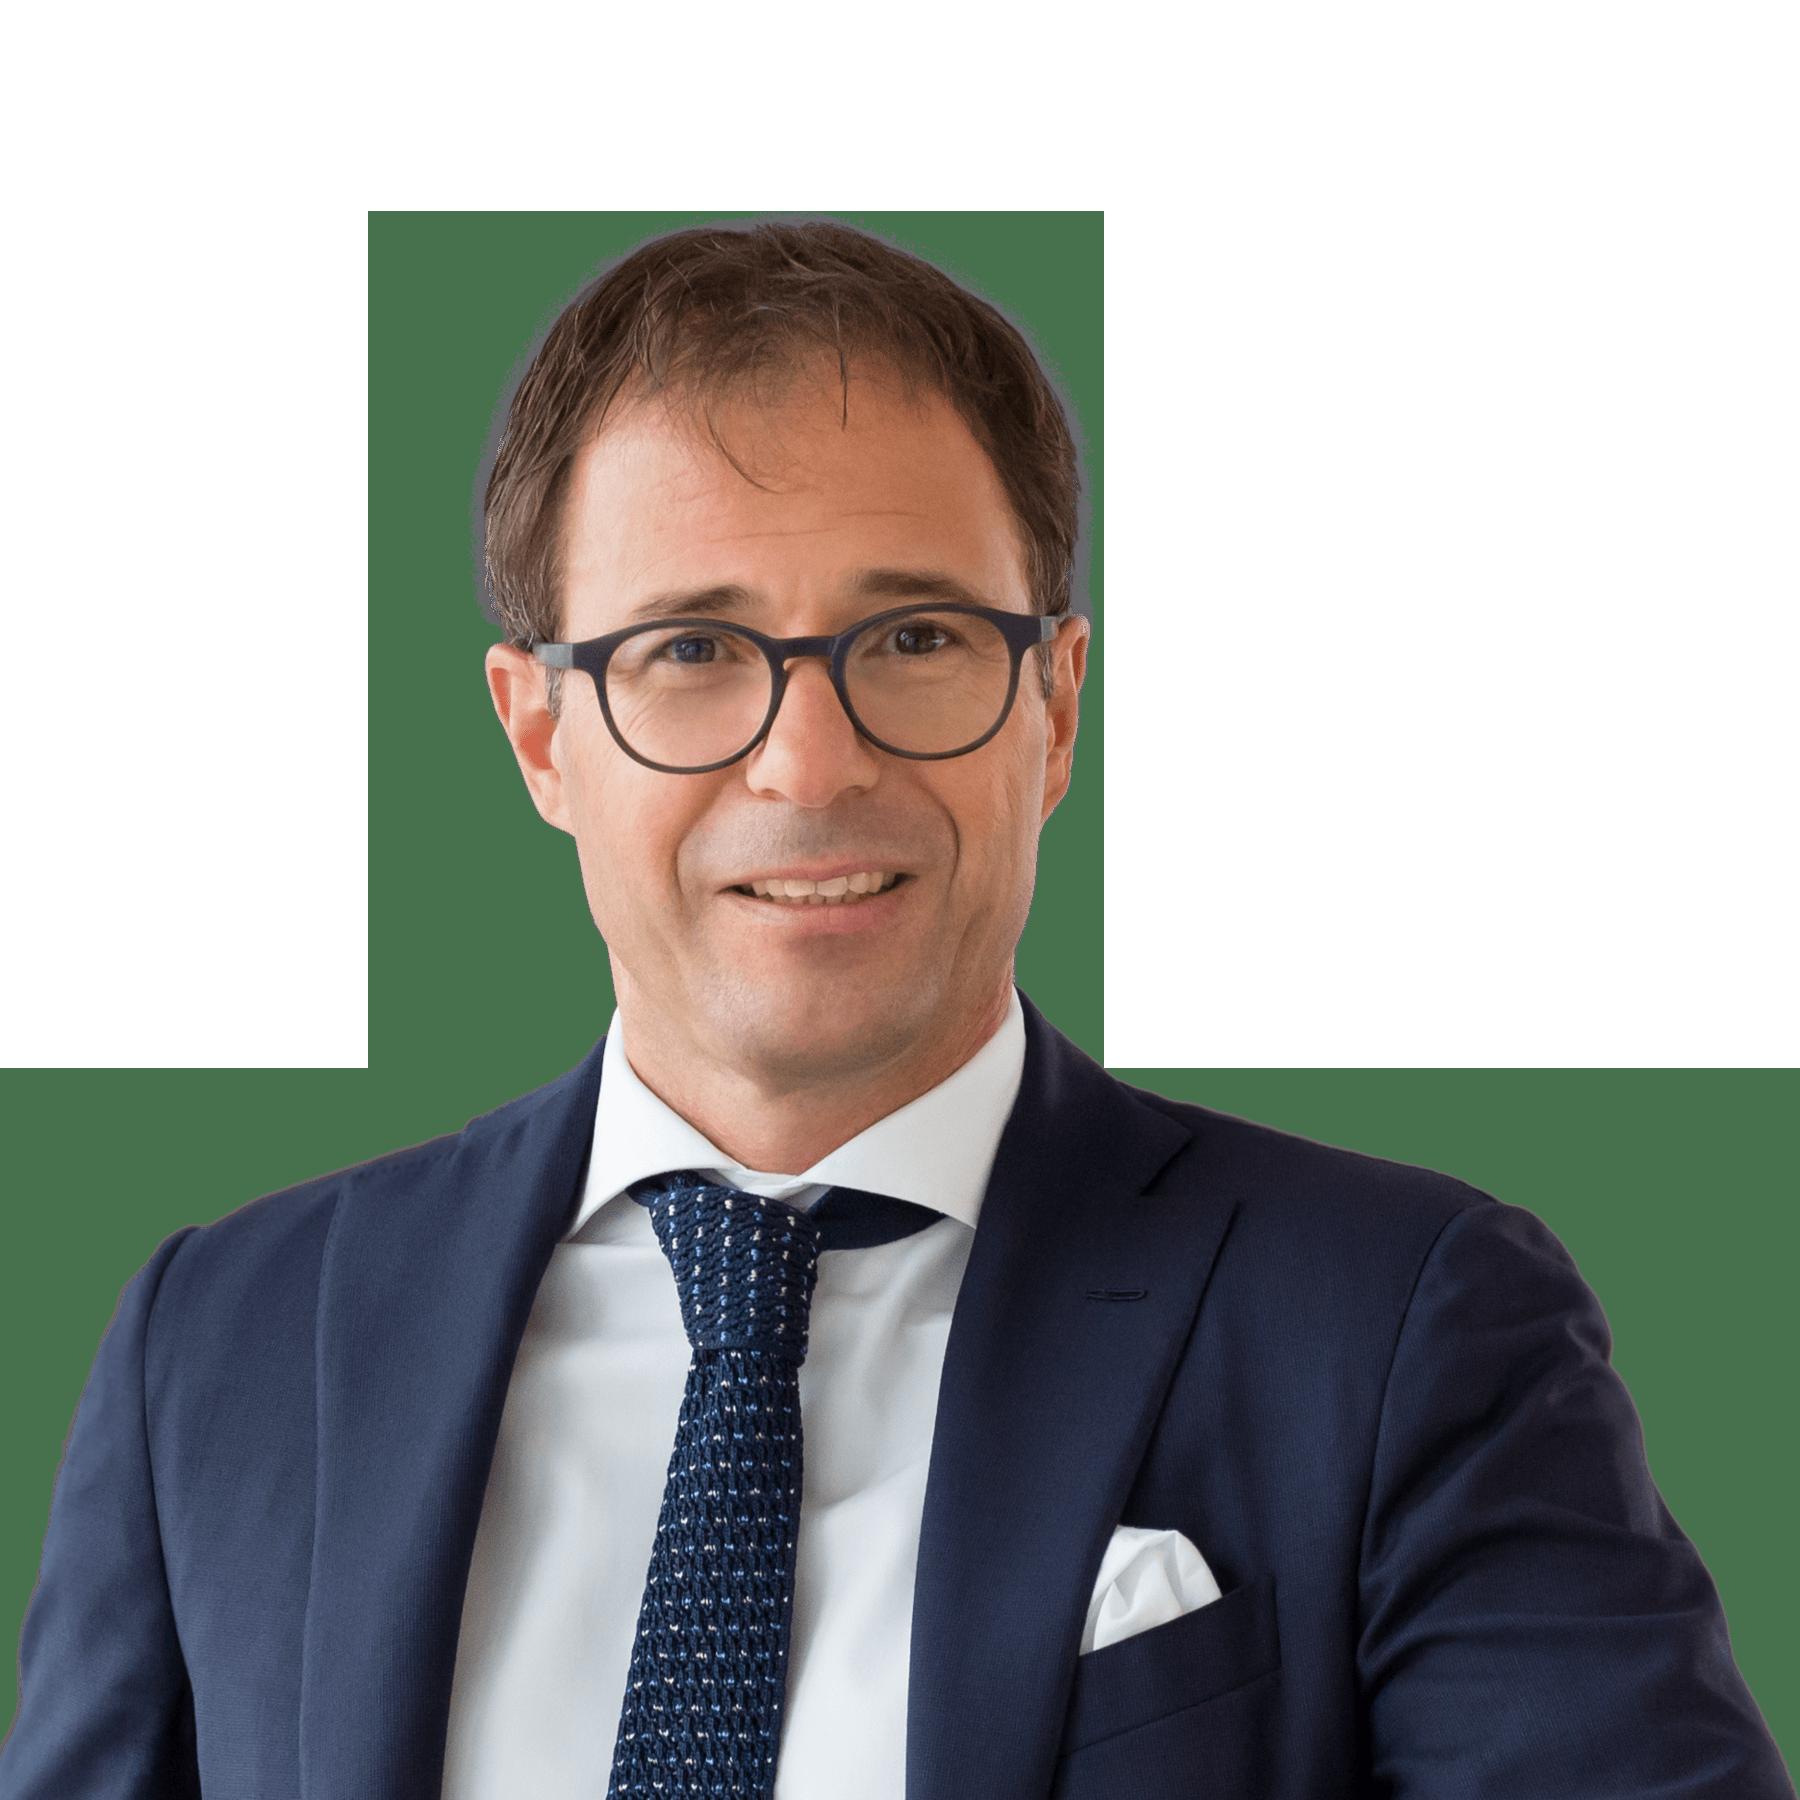 Dr. Jürgen Gros